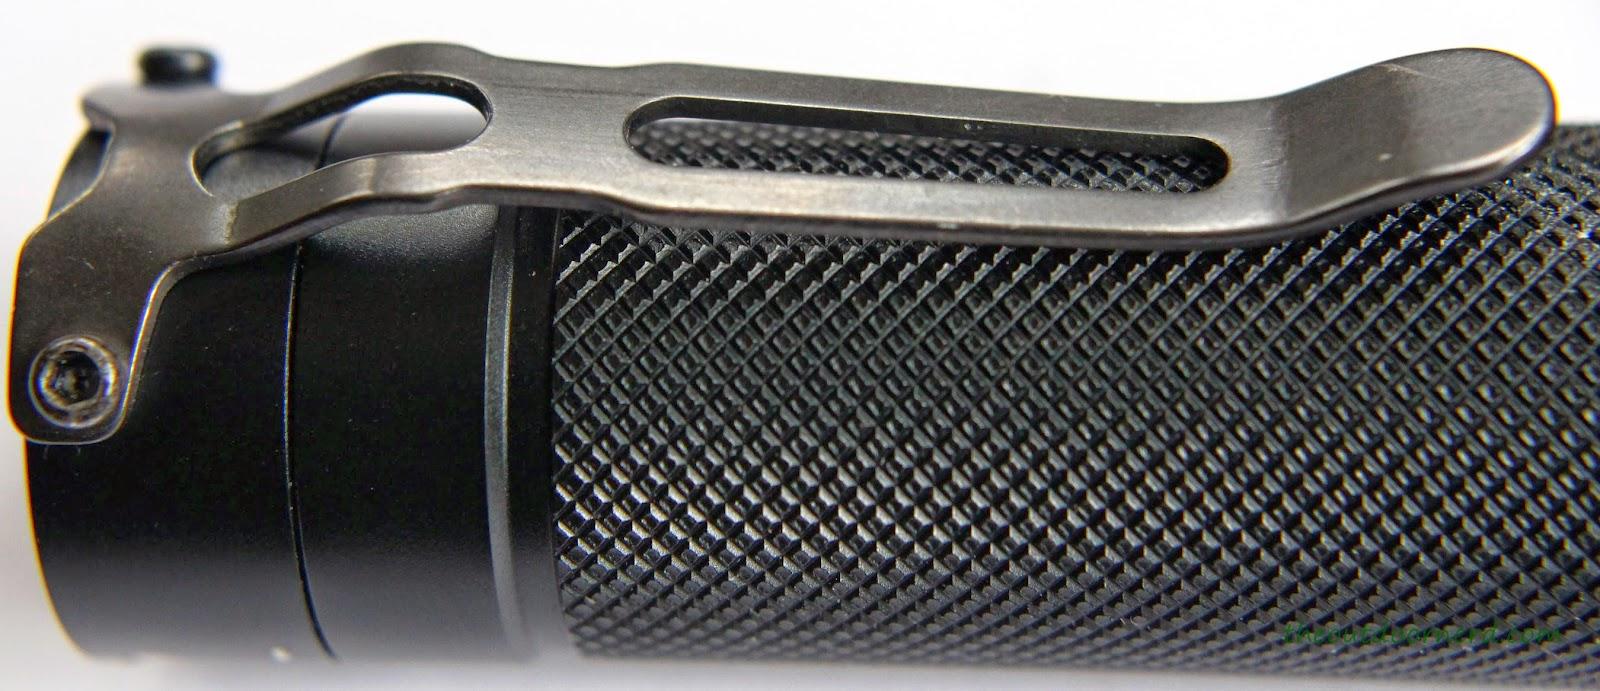 EagleTac D25LC2 Mini 18650 Flashlight Clip 1